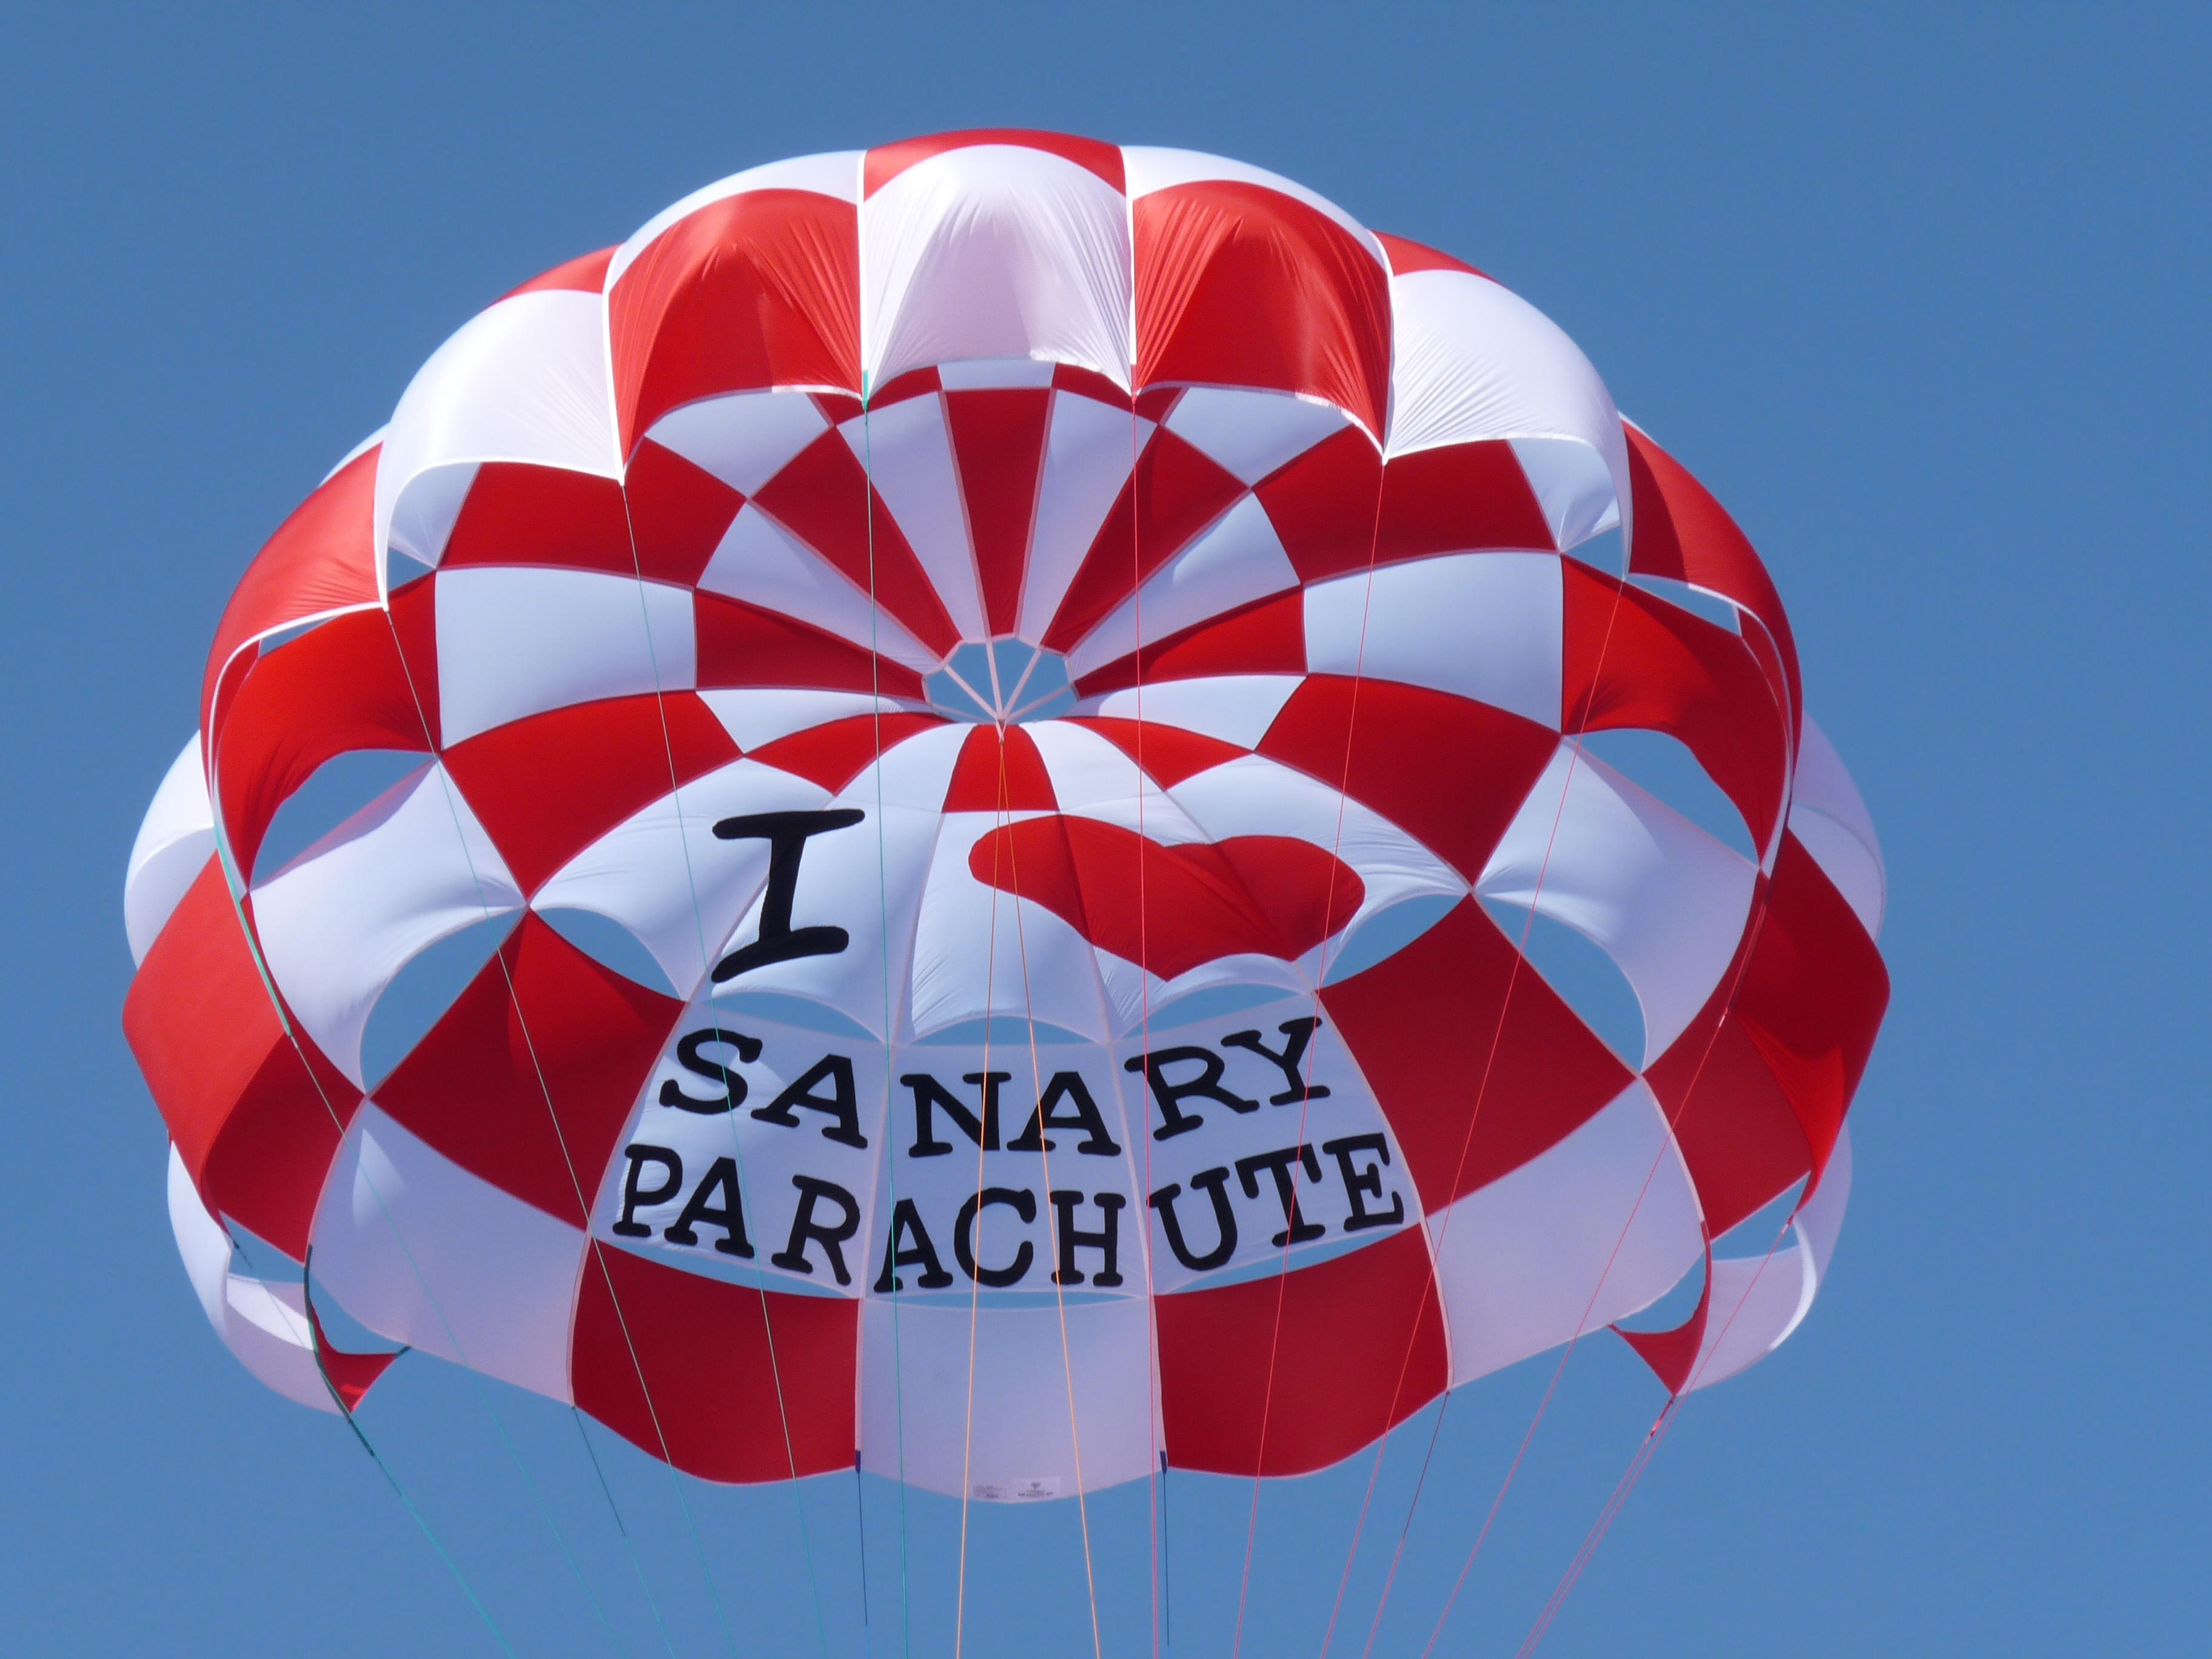 SANARY PARACHUTE